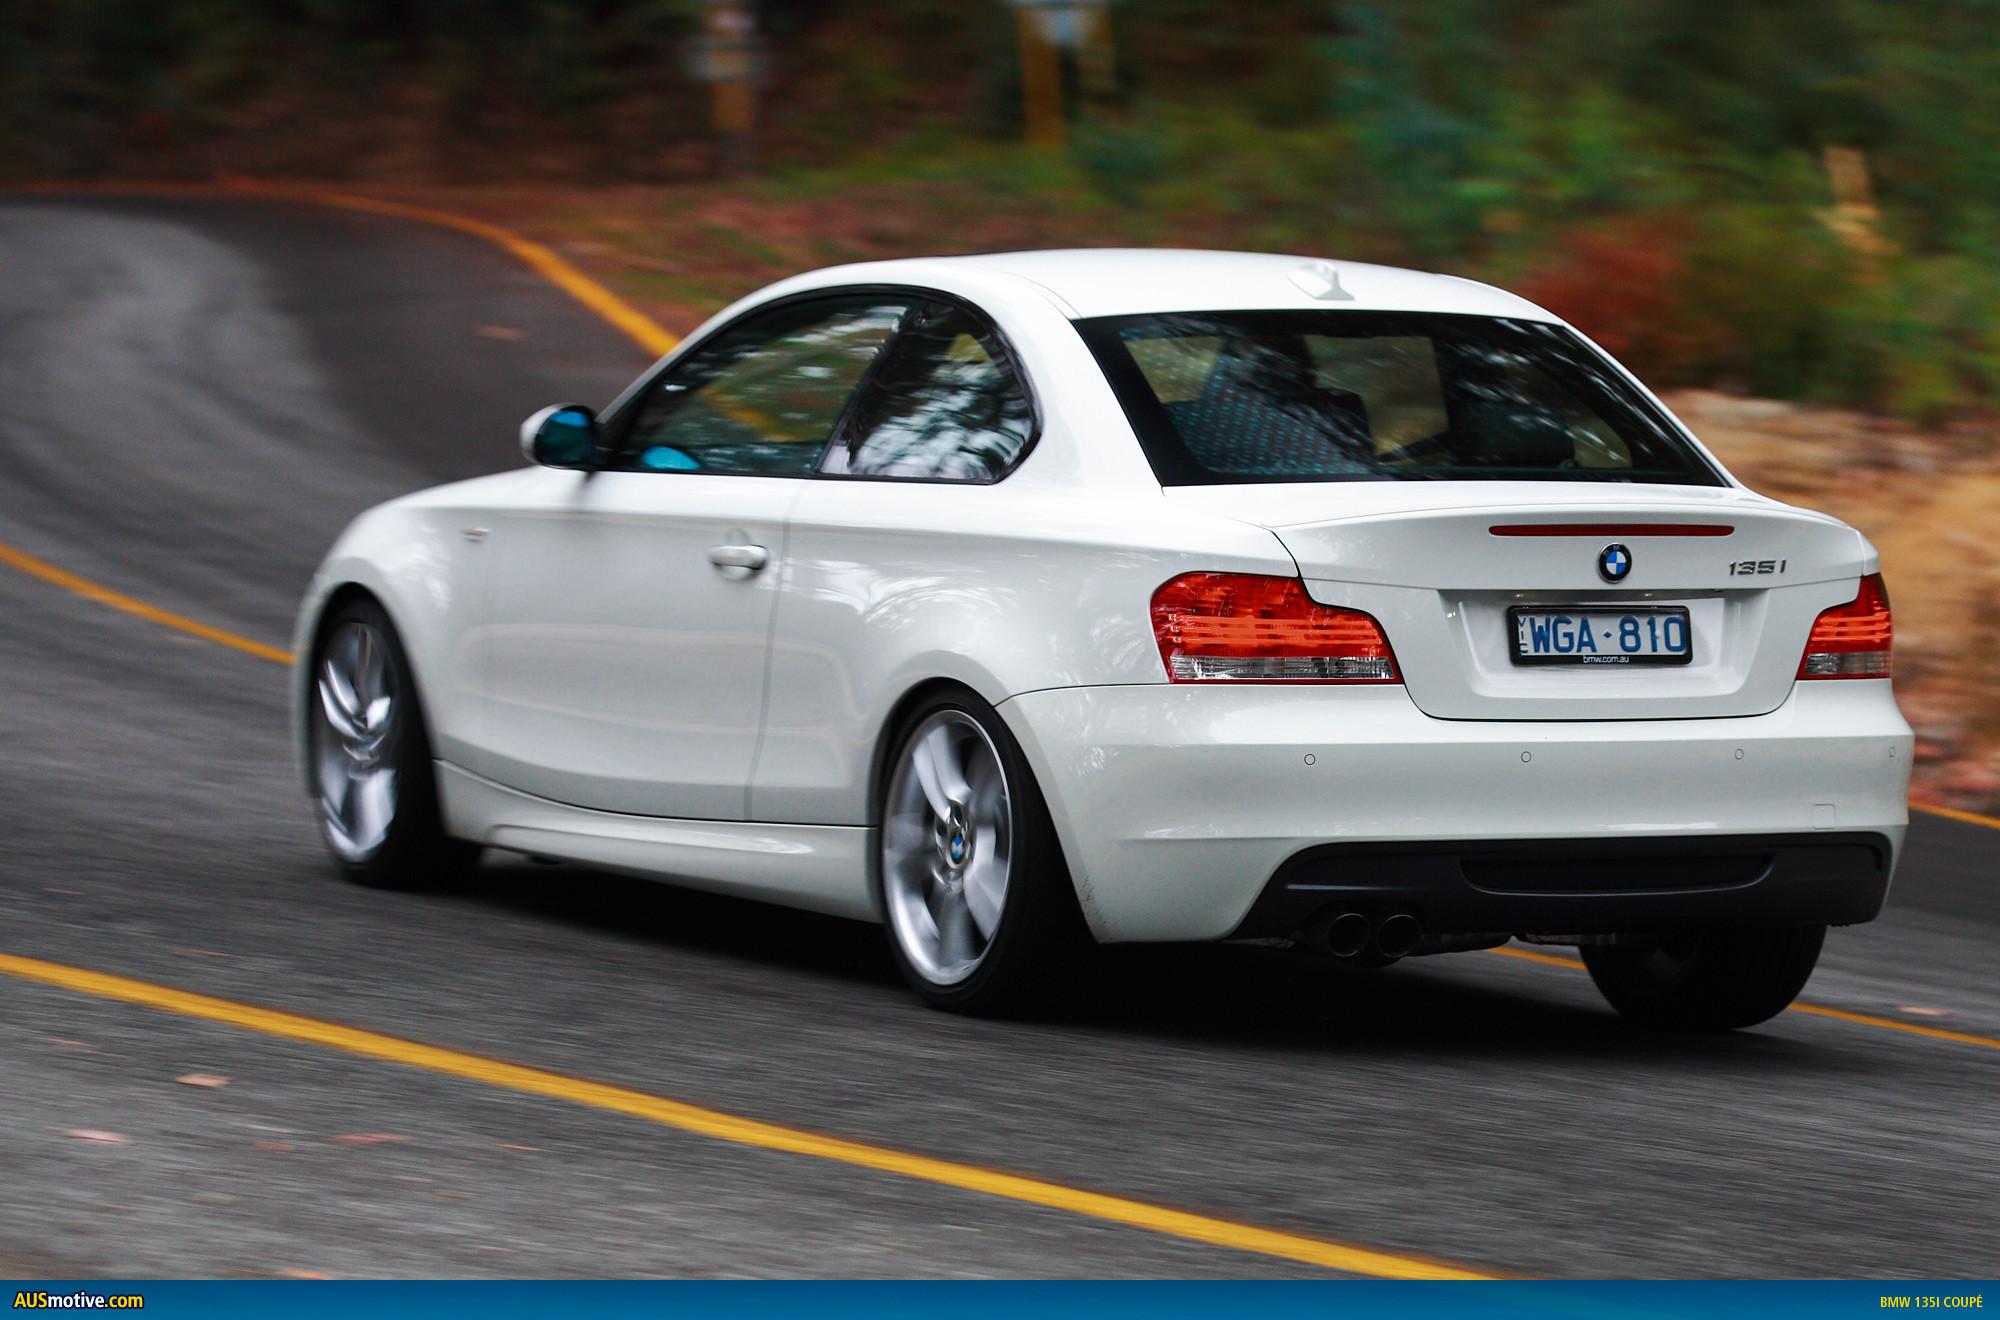 Res: 2000x1320, BMW 135i